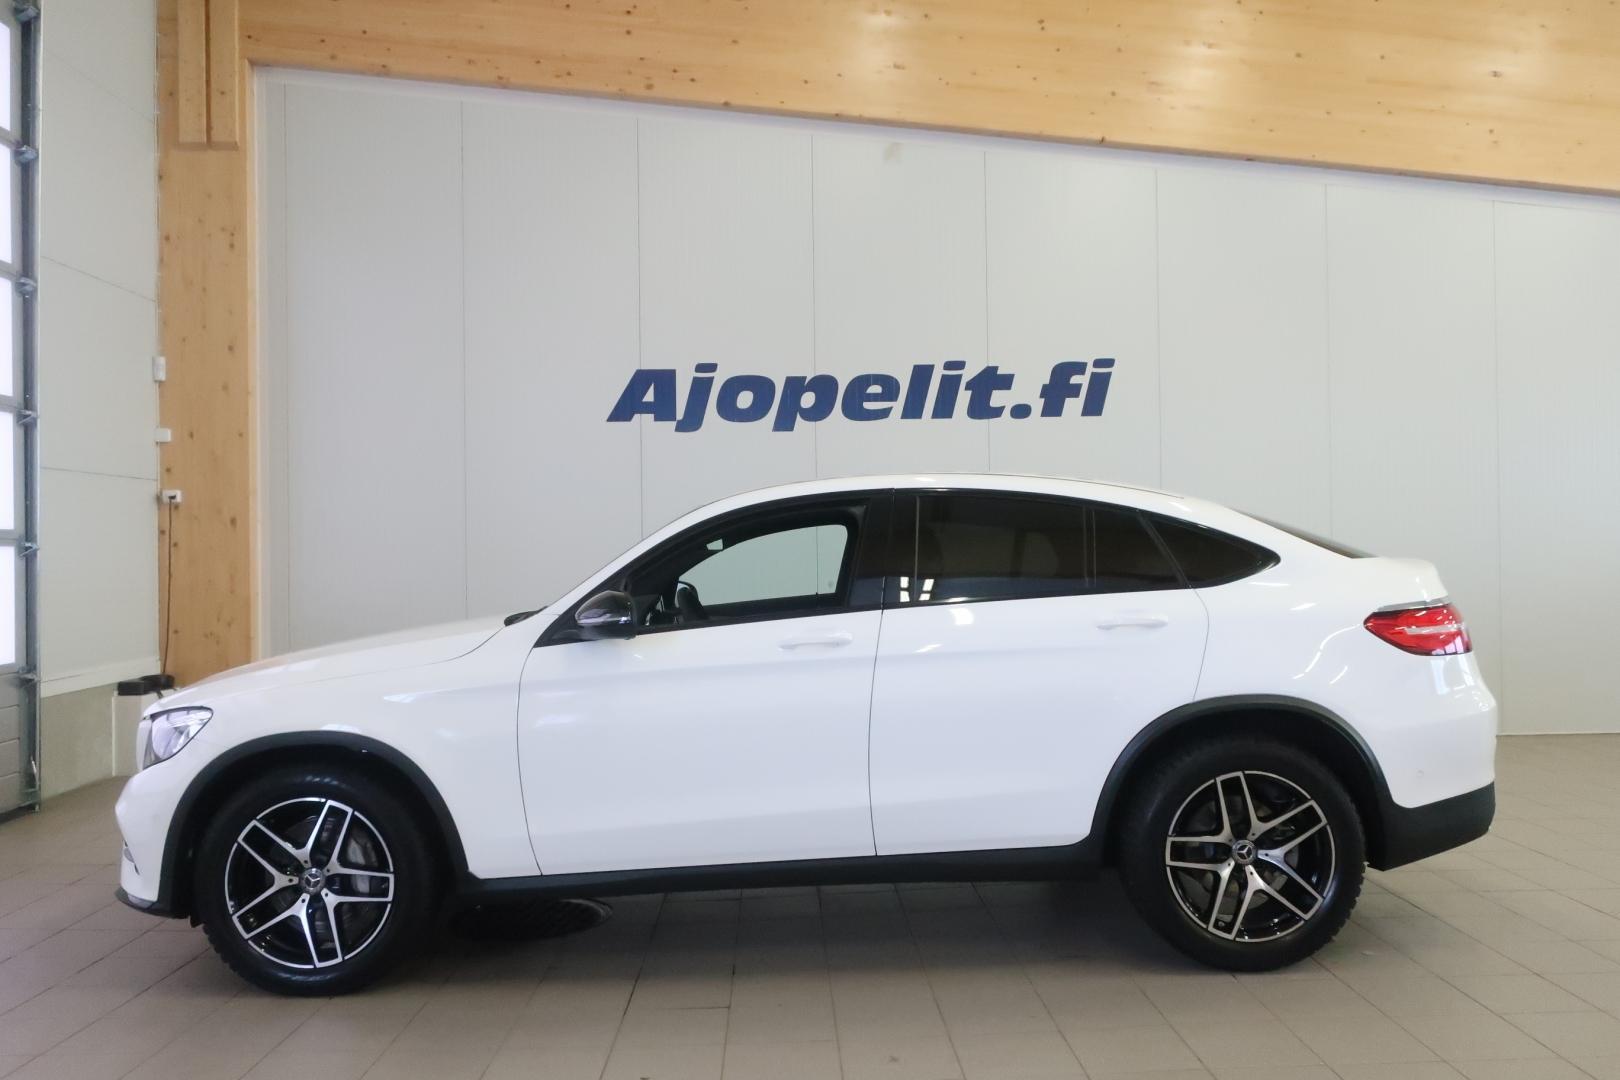 Mercedes-Benz GLC, 220 d 4Matic A Premium Business AMG , Uusi ovh. 84475,- Rahoituskorko 1.99%